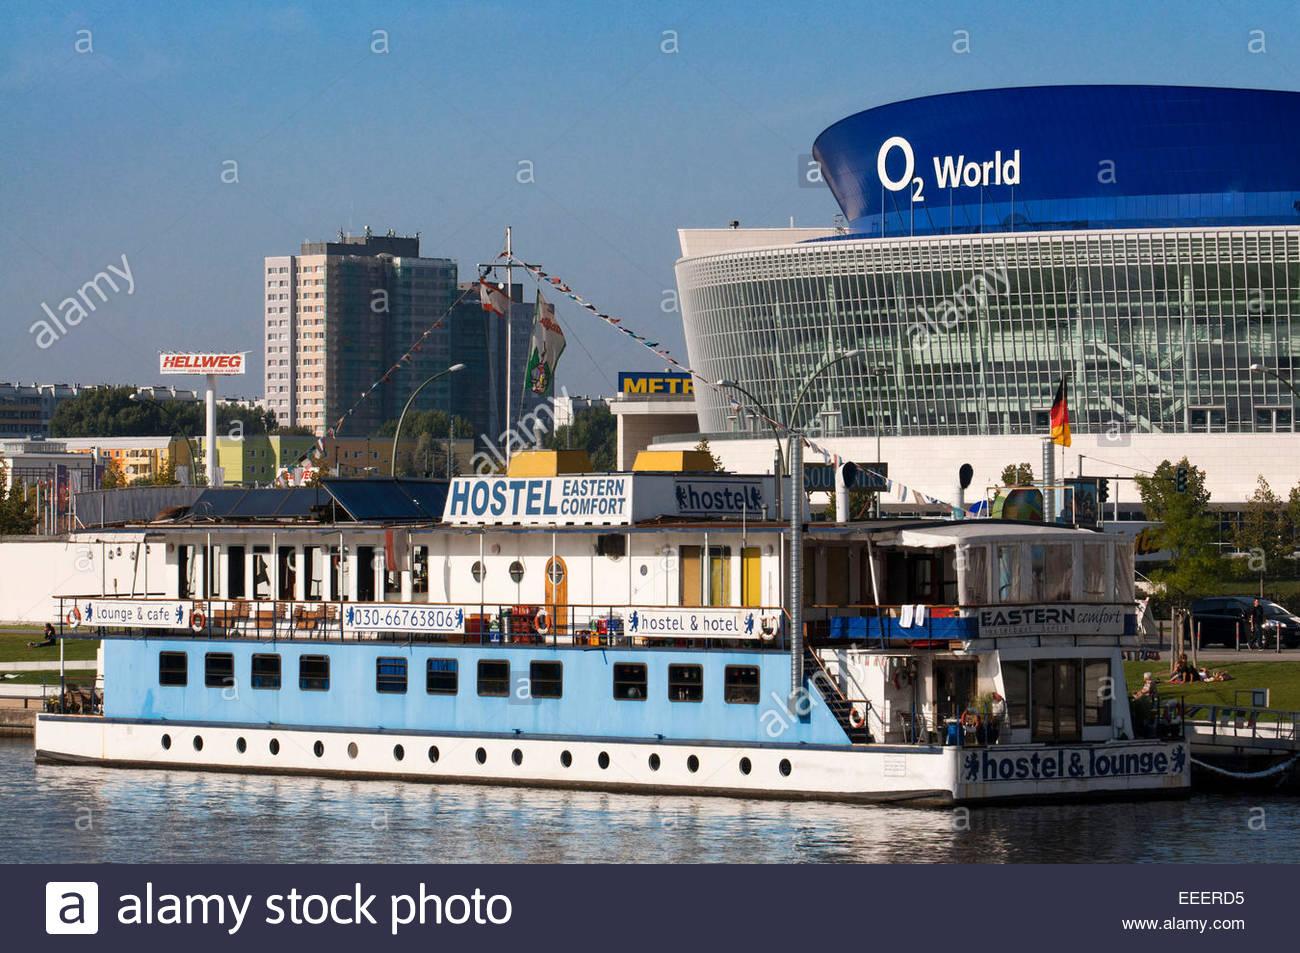 O2 World de Berlín Spree EASTERN COMFORT HOSTEL. El hostal barcos 'Eastern Comfort y comodidad occidental', Imagen De Stock